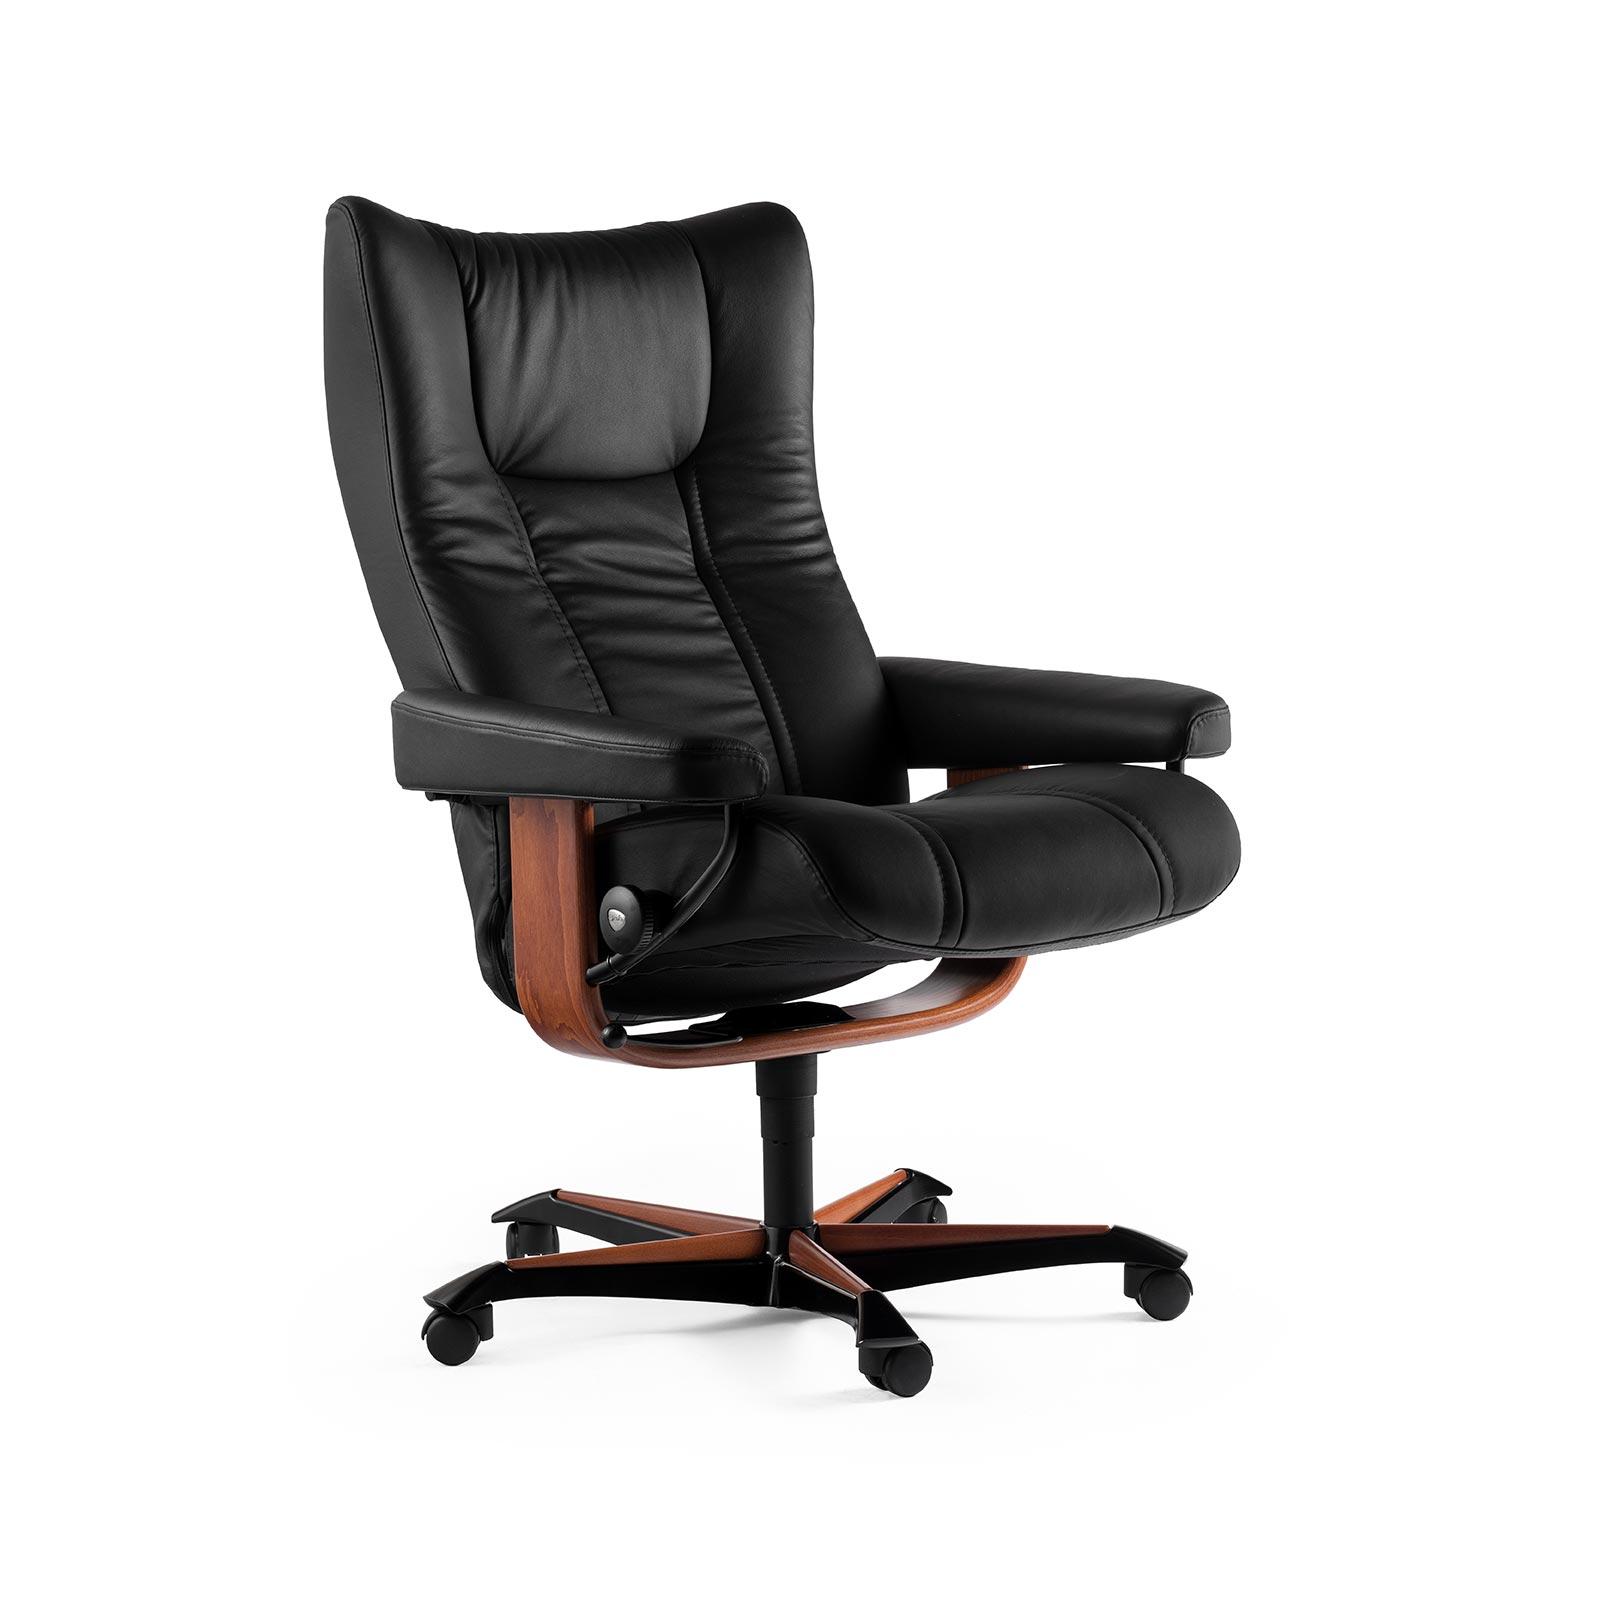 stressless sessel wing home office m black stressless. Black Bedroom Furniture Sets. Home Design Ideas